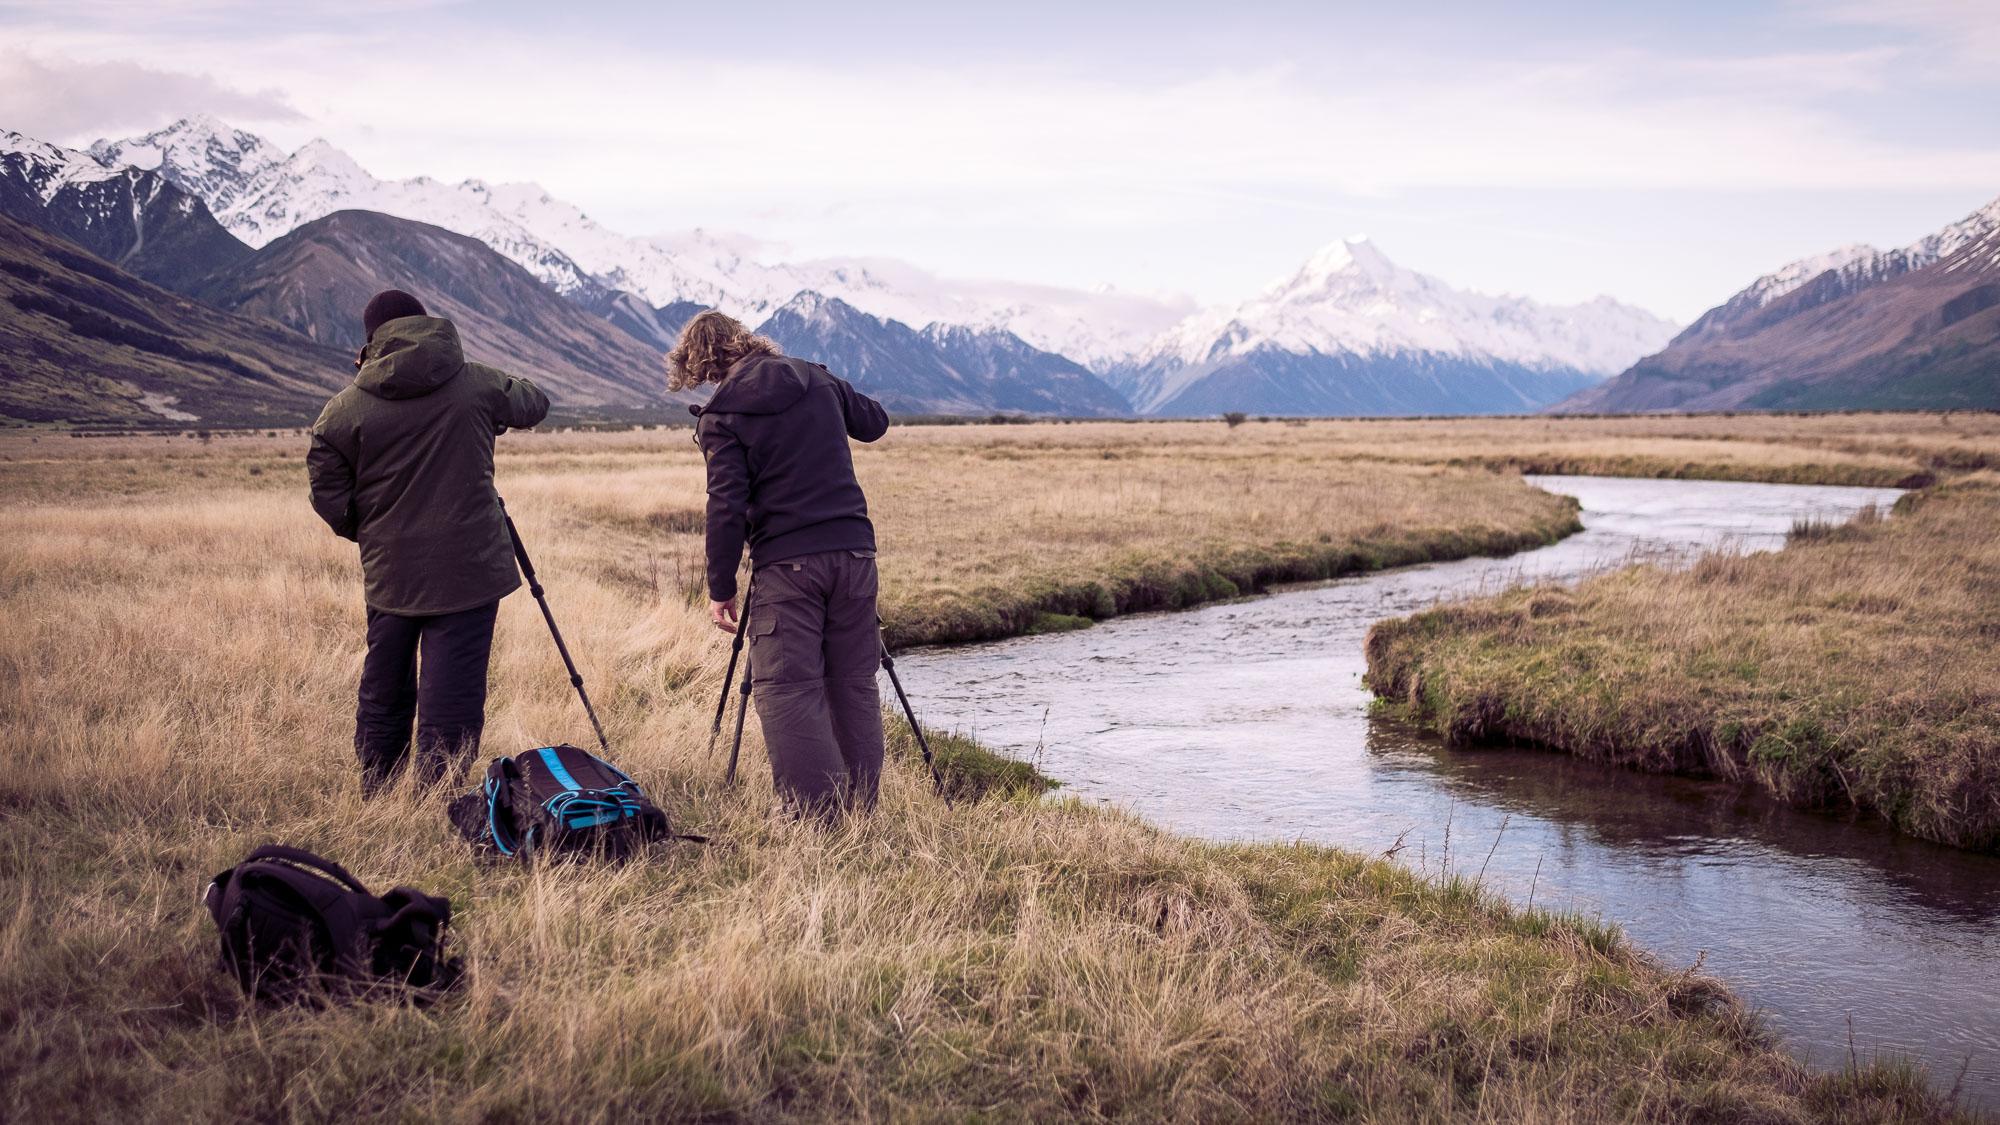 photography-workshop-newzealand-mountcook2018-17.jpg